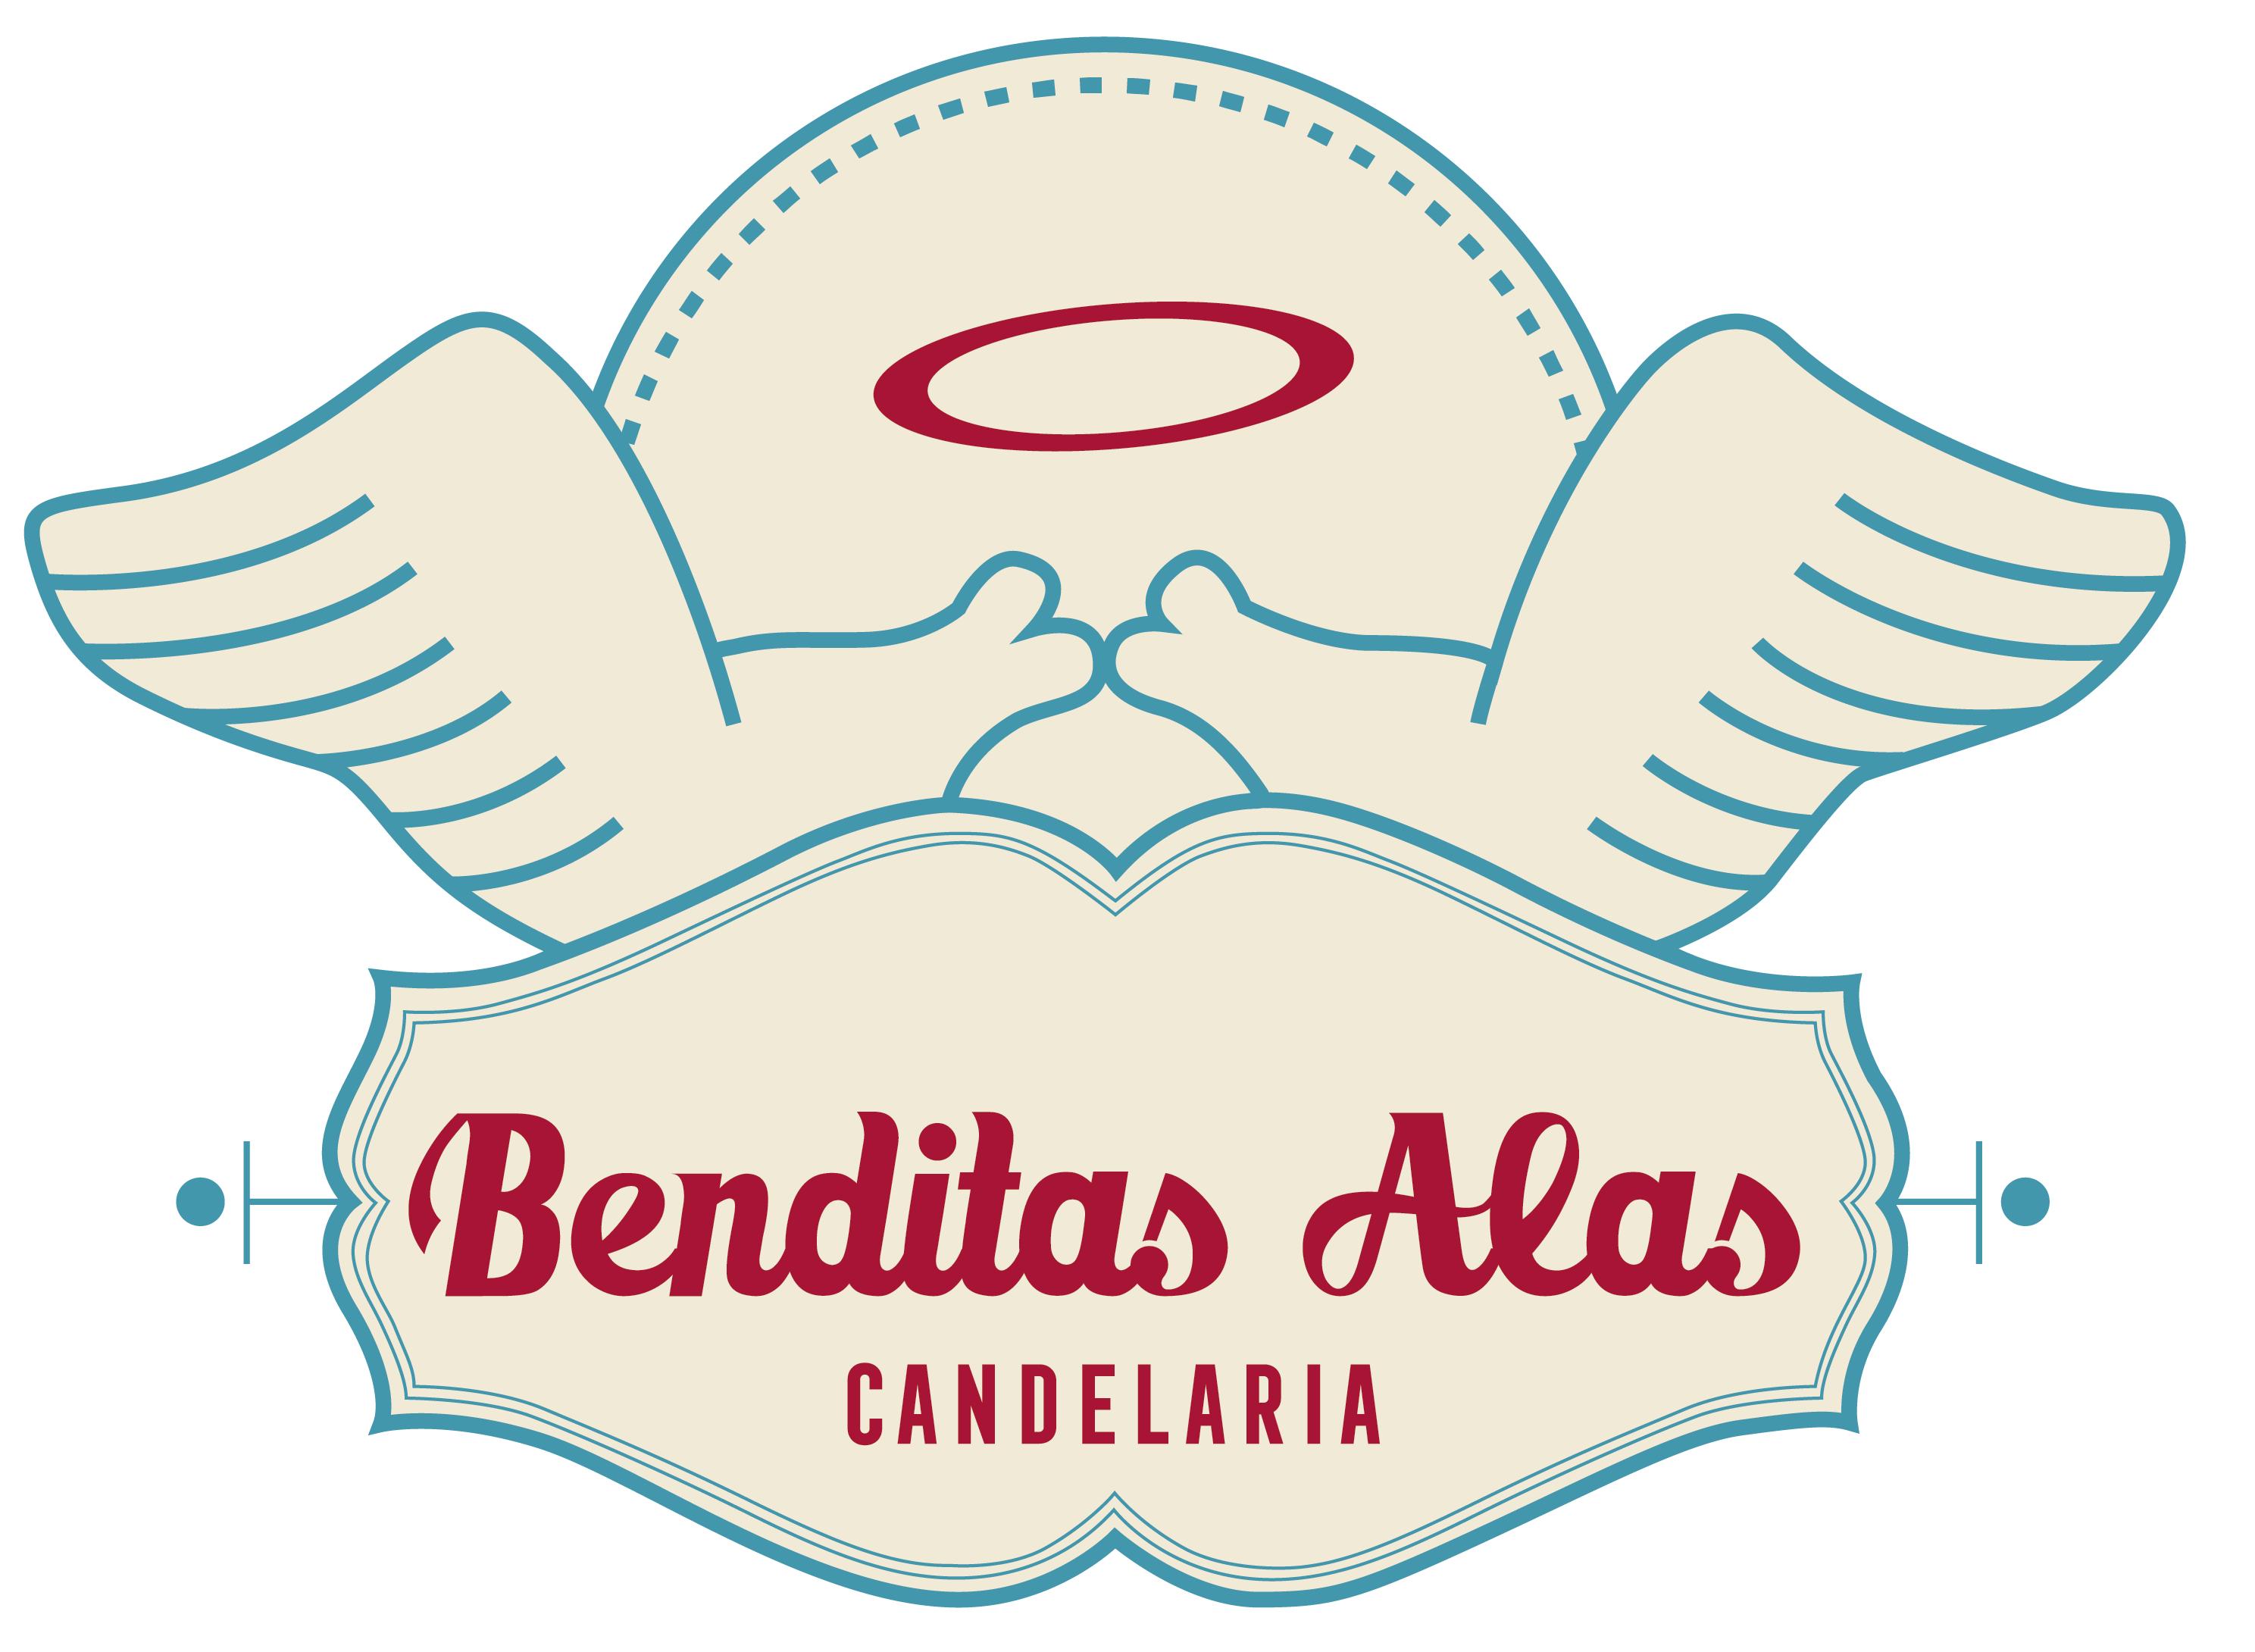 Benditas Alas Candelaria